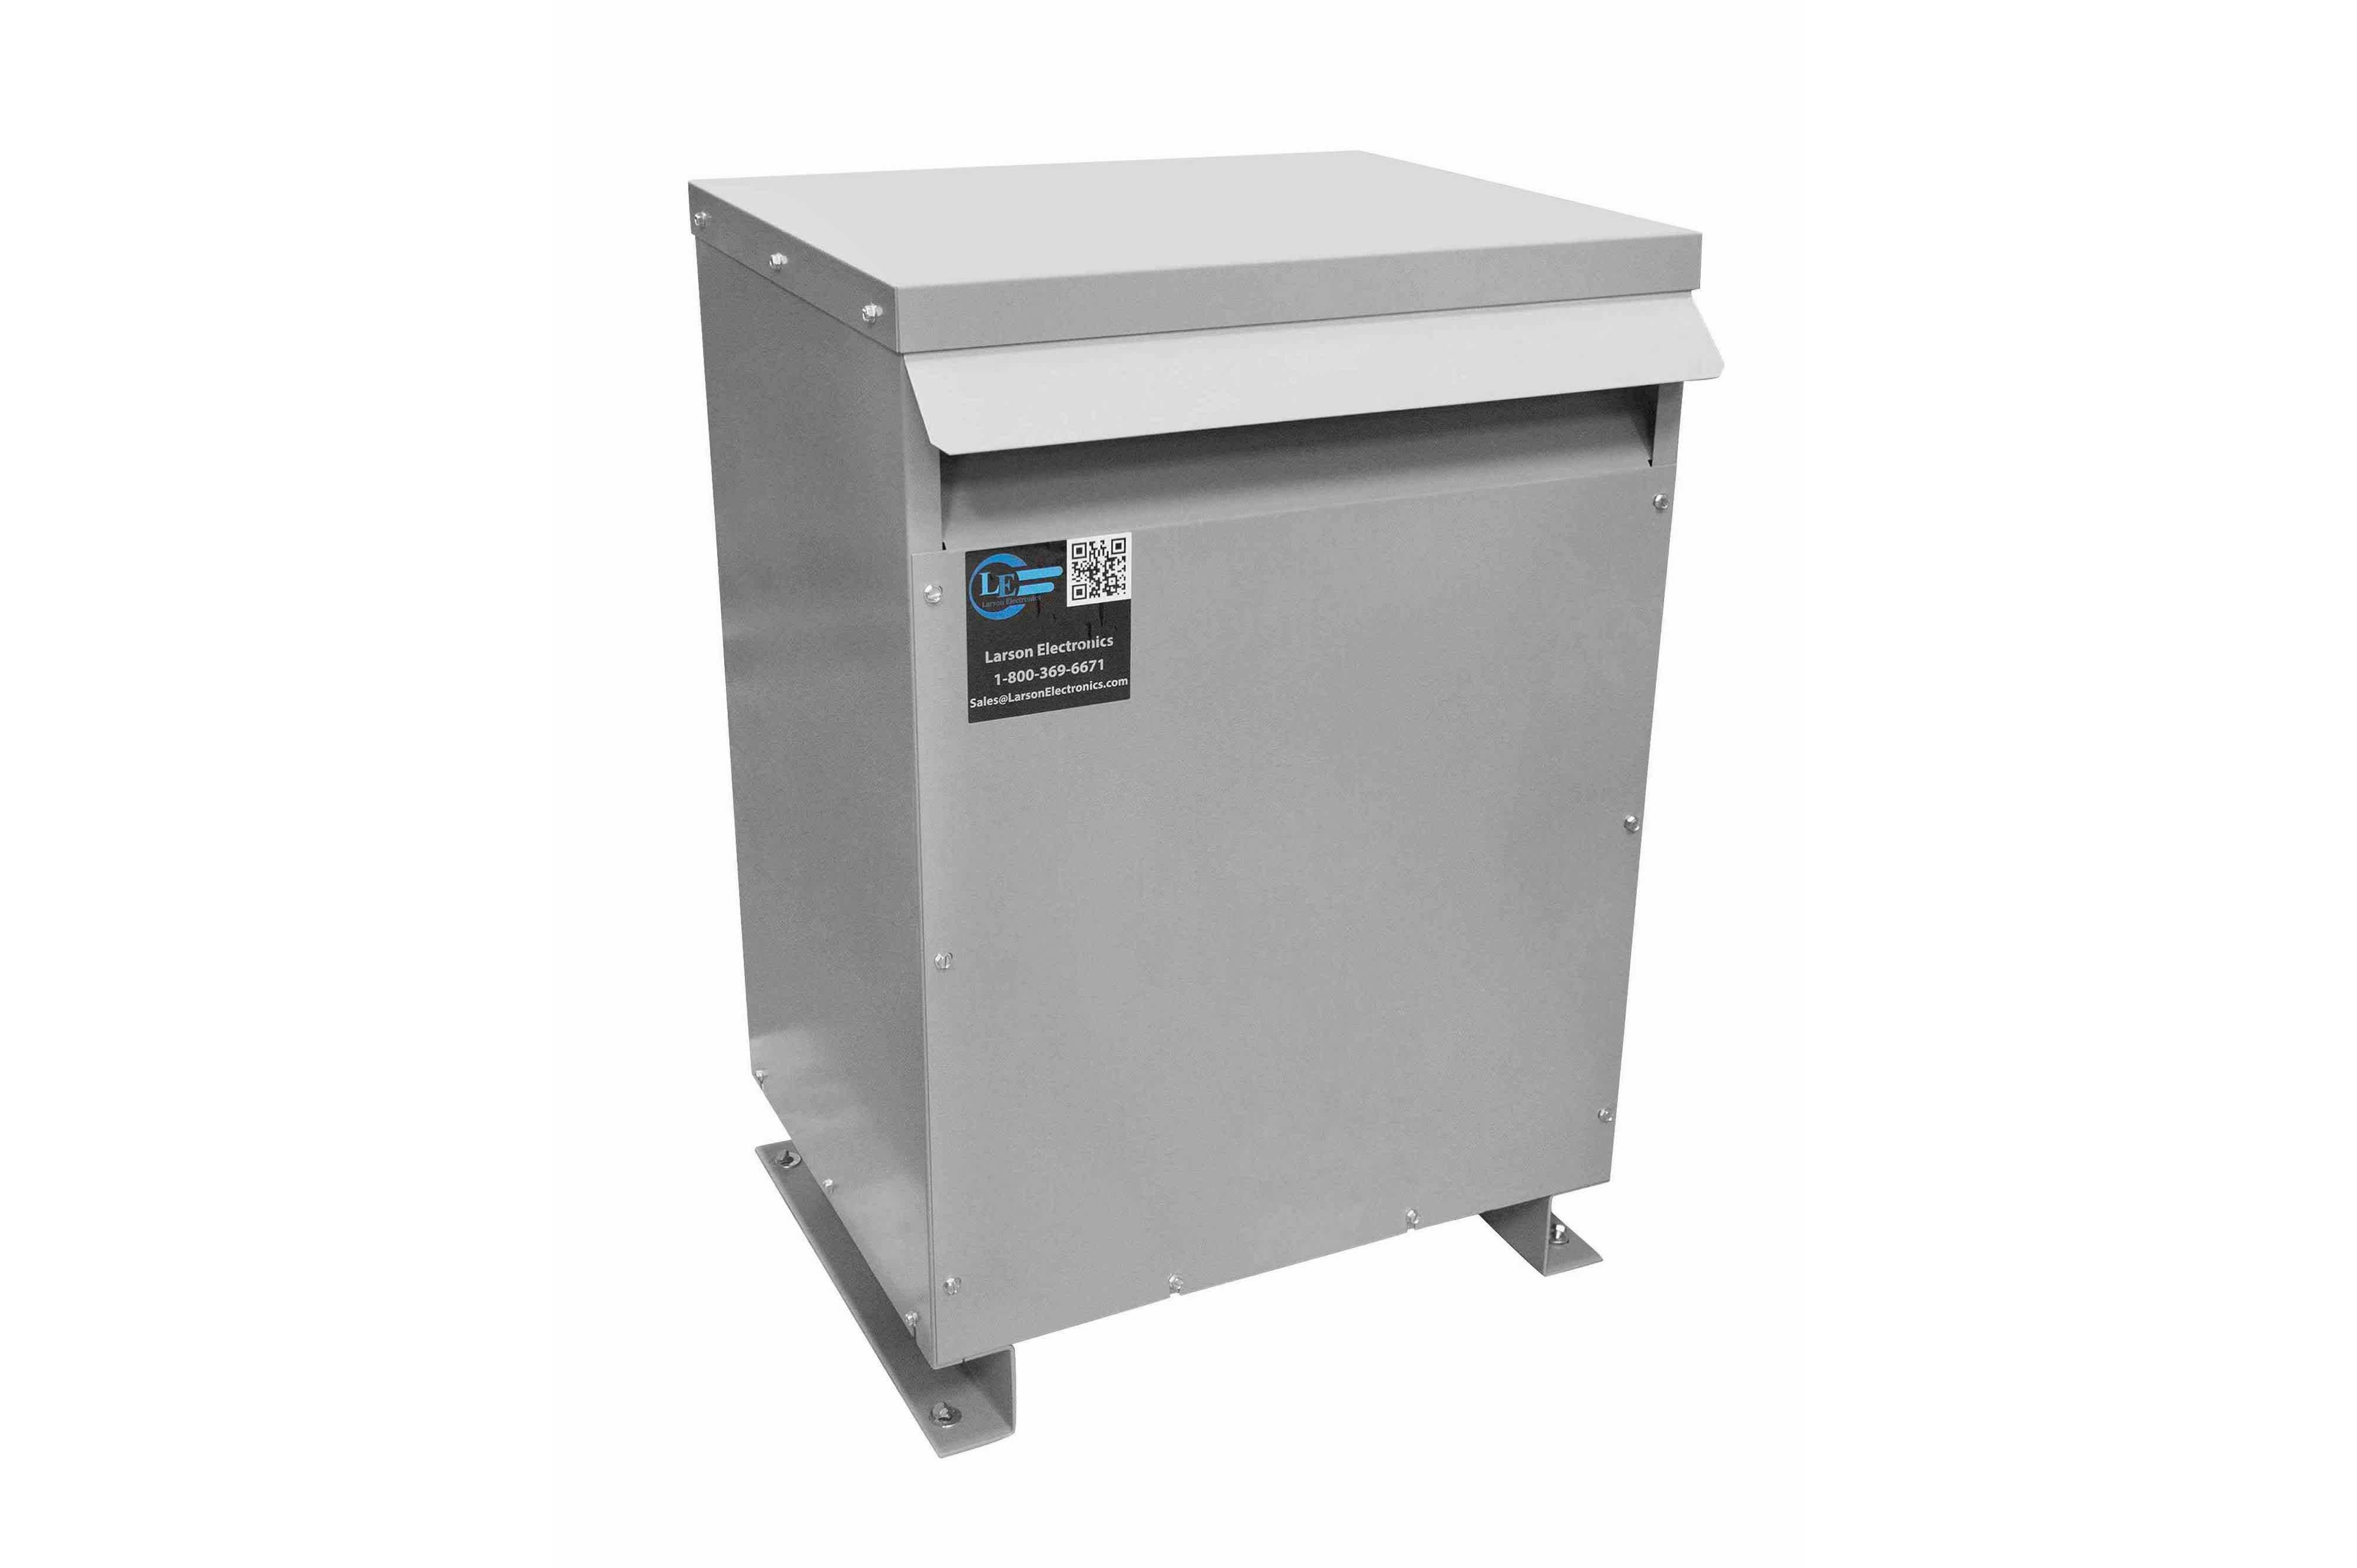 32.5 kVA 3PH Isolation Transformer, 400V Wye Primary, 480V Delta Secondary, N3R, Ventilated, 60 Hz